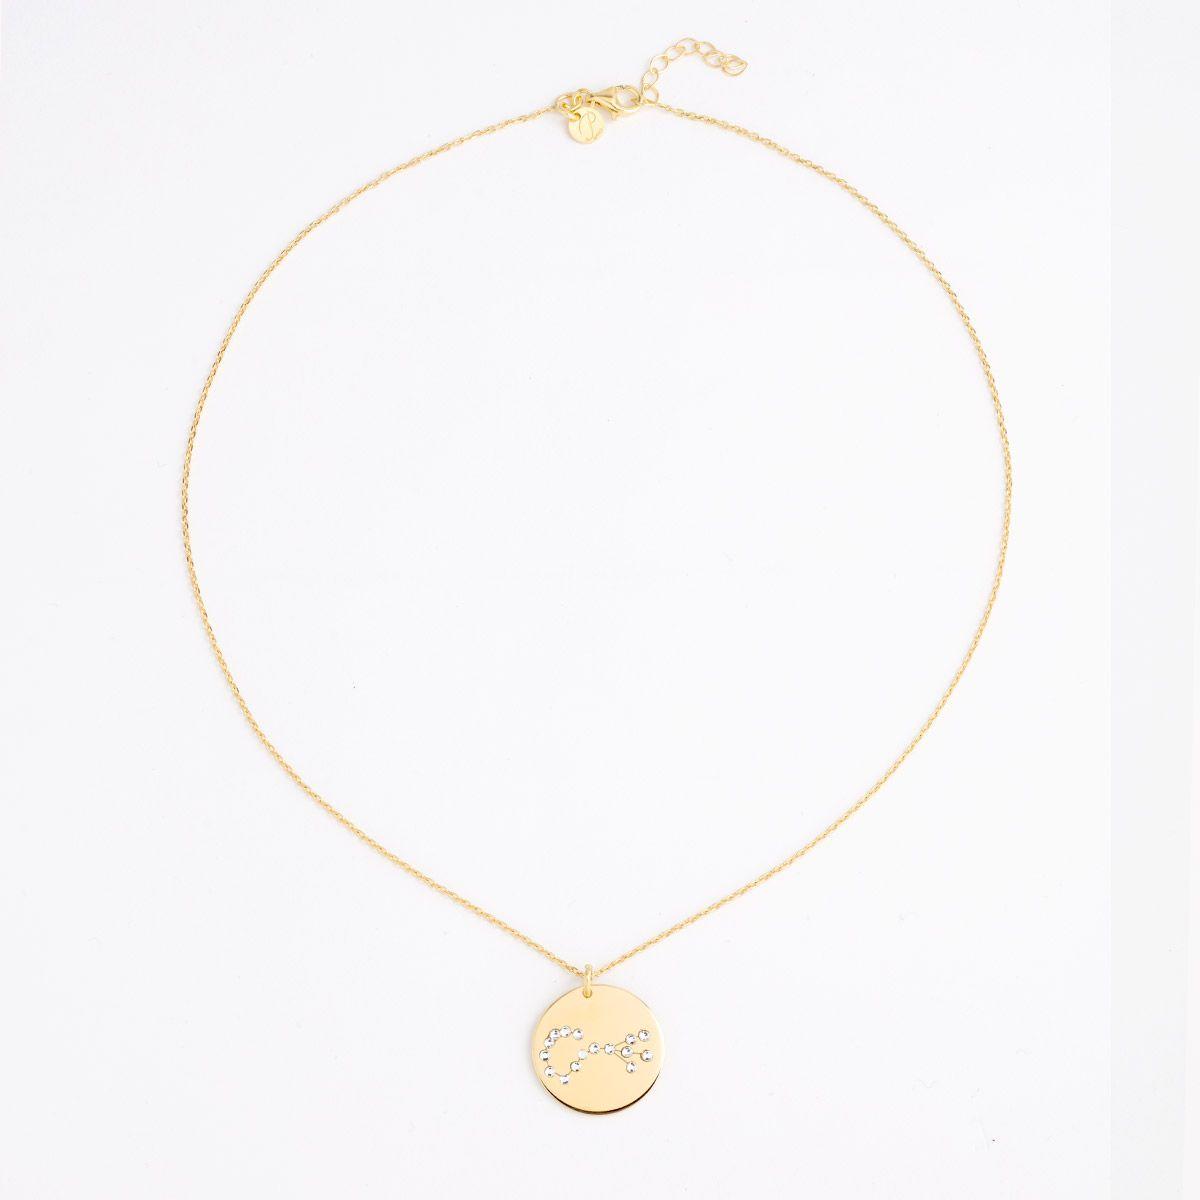 Kiana - Halsketten - 18k vergoldet